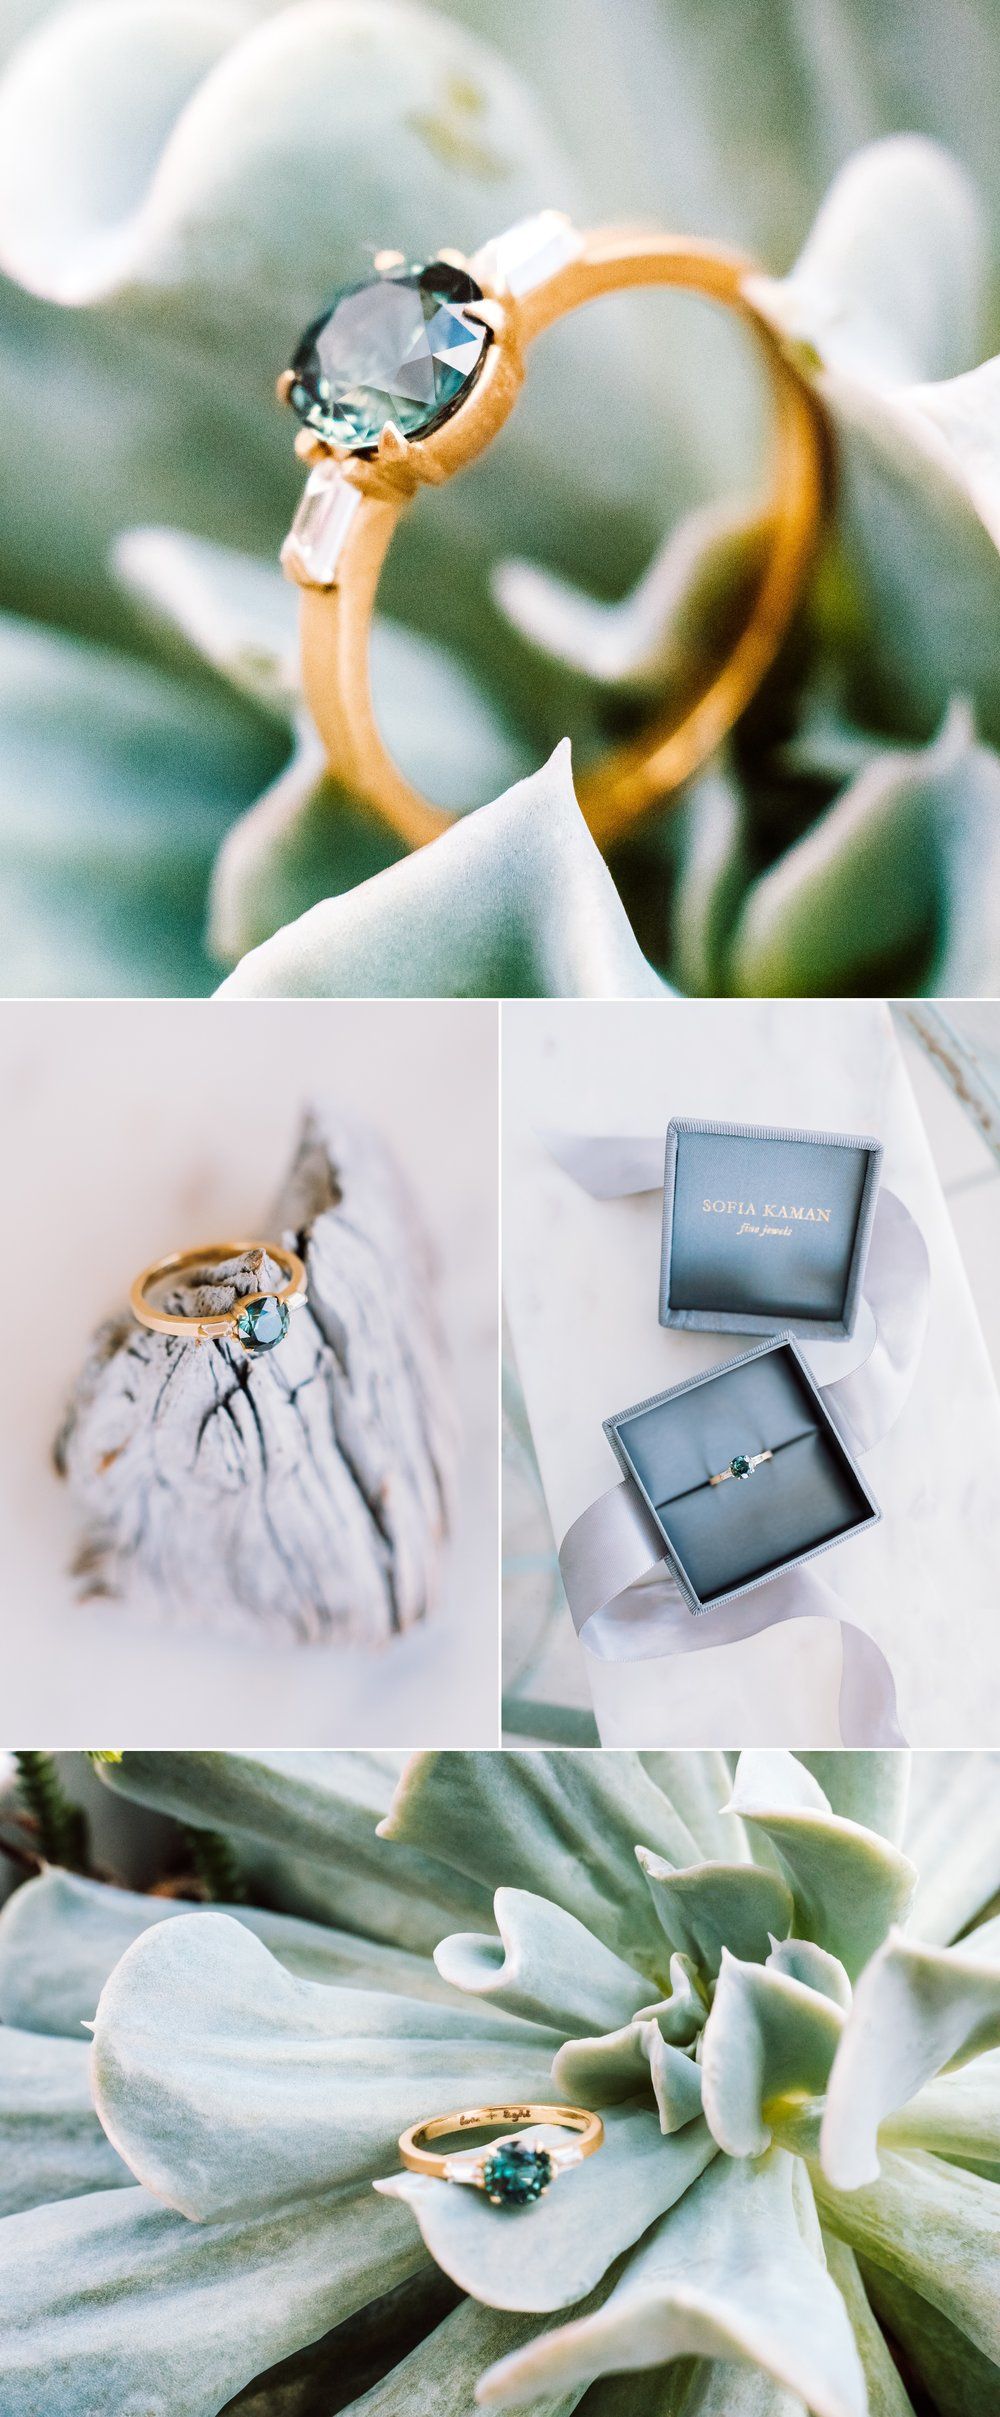 Sofia Kaman custom ring design- bi-color teal sapphire baguette diamond engagement ring matte band